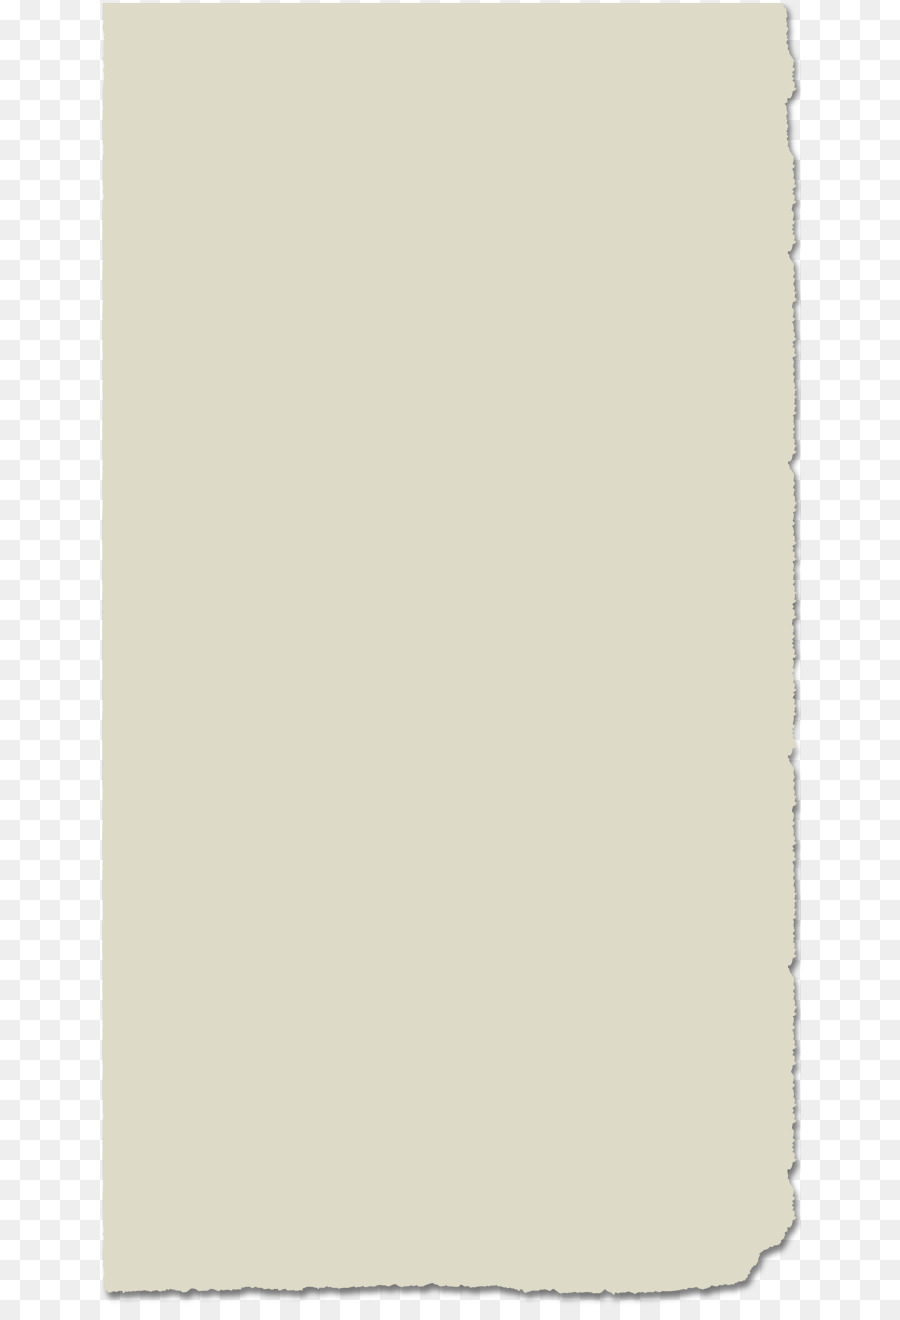 Paper Square png download - 702*1310 - Free Transparent Paper png